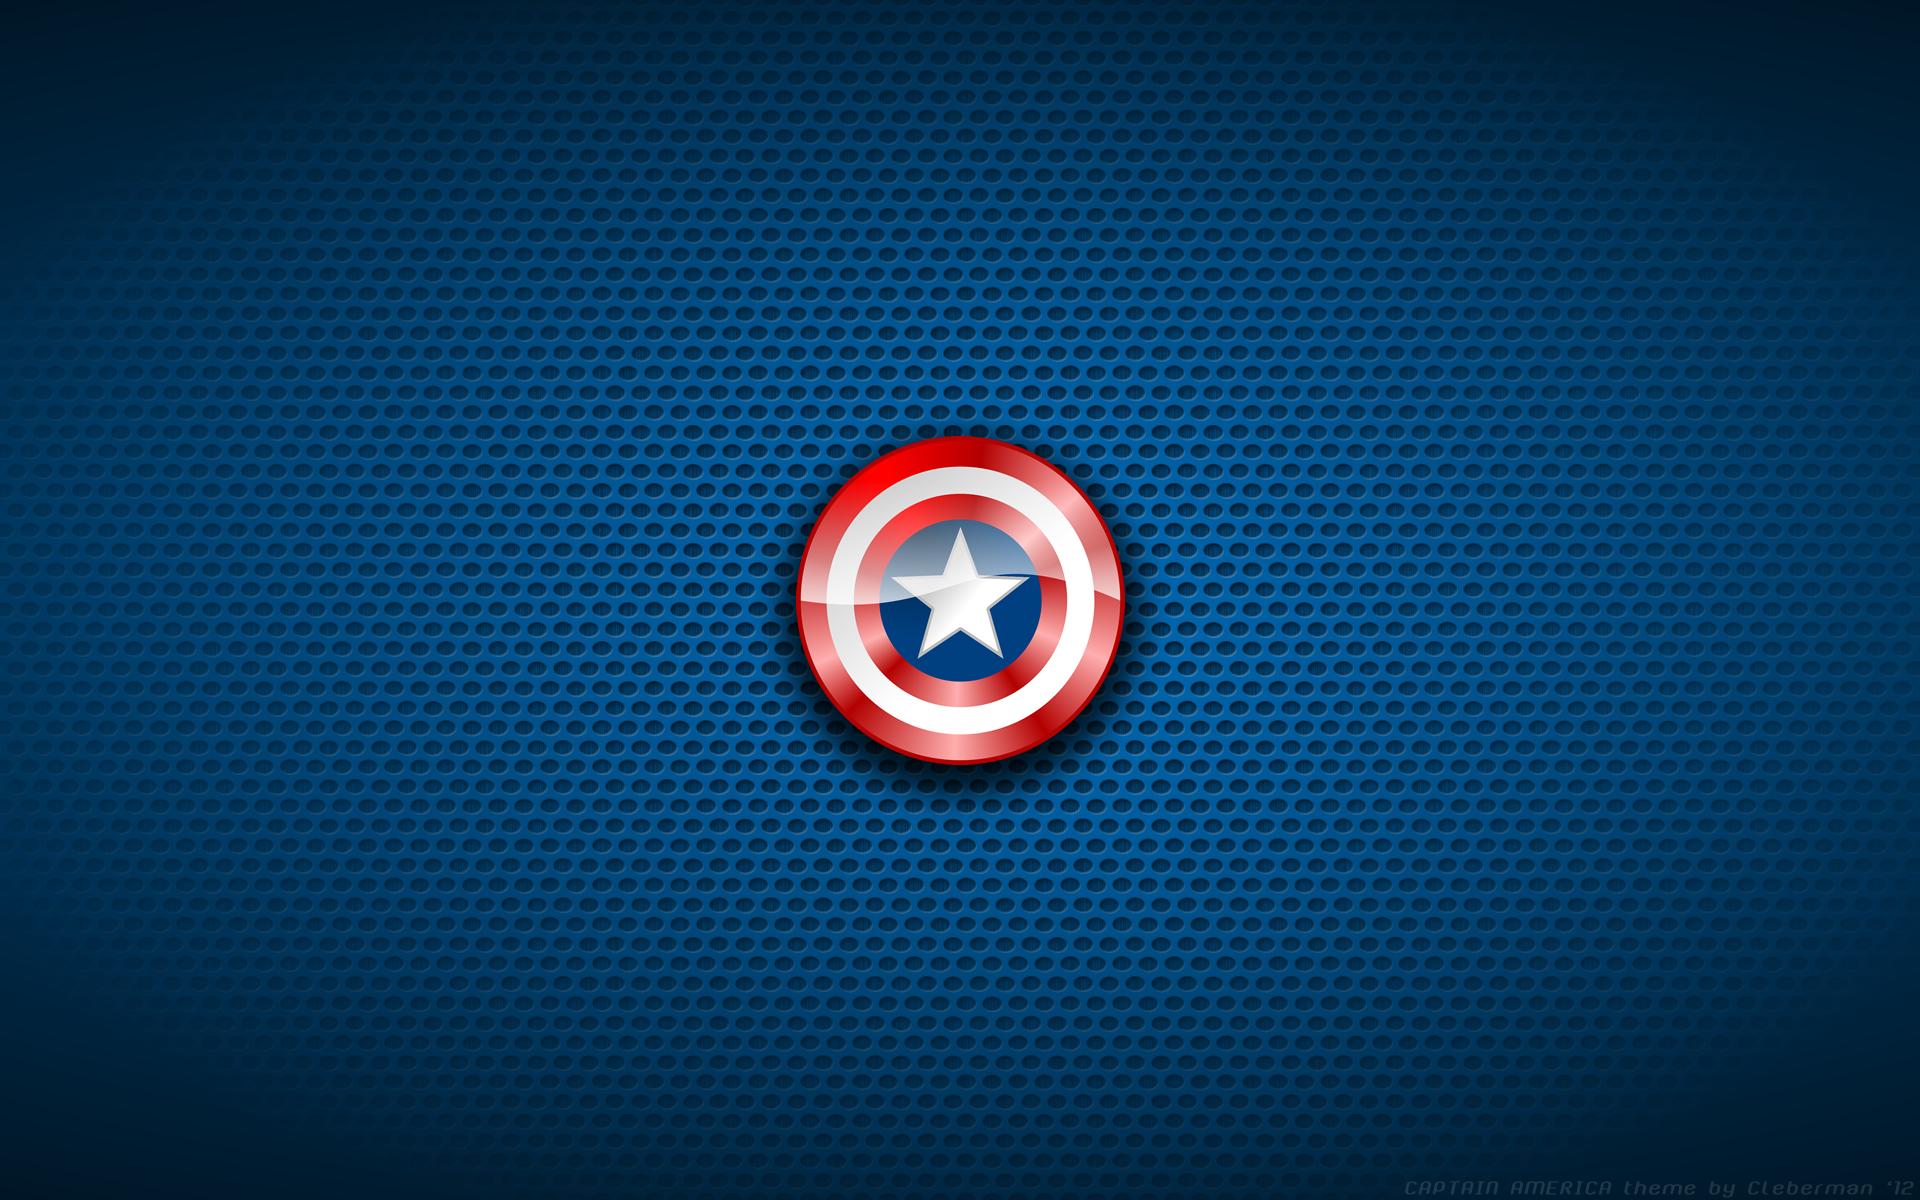 Captain america full hd wallpaper and background image - Captain america screensaver download ...